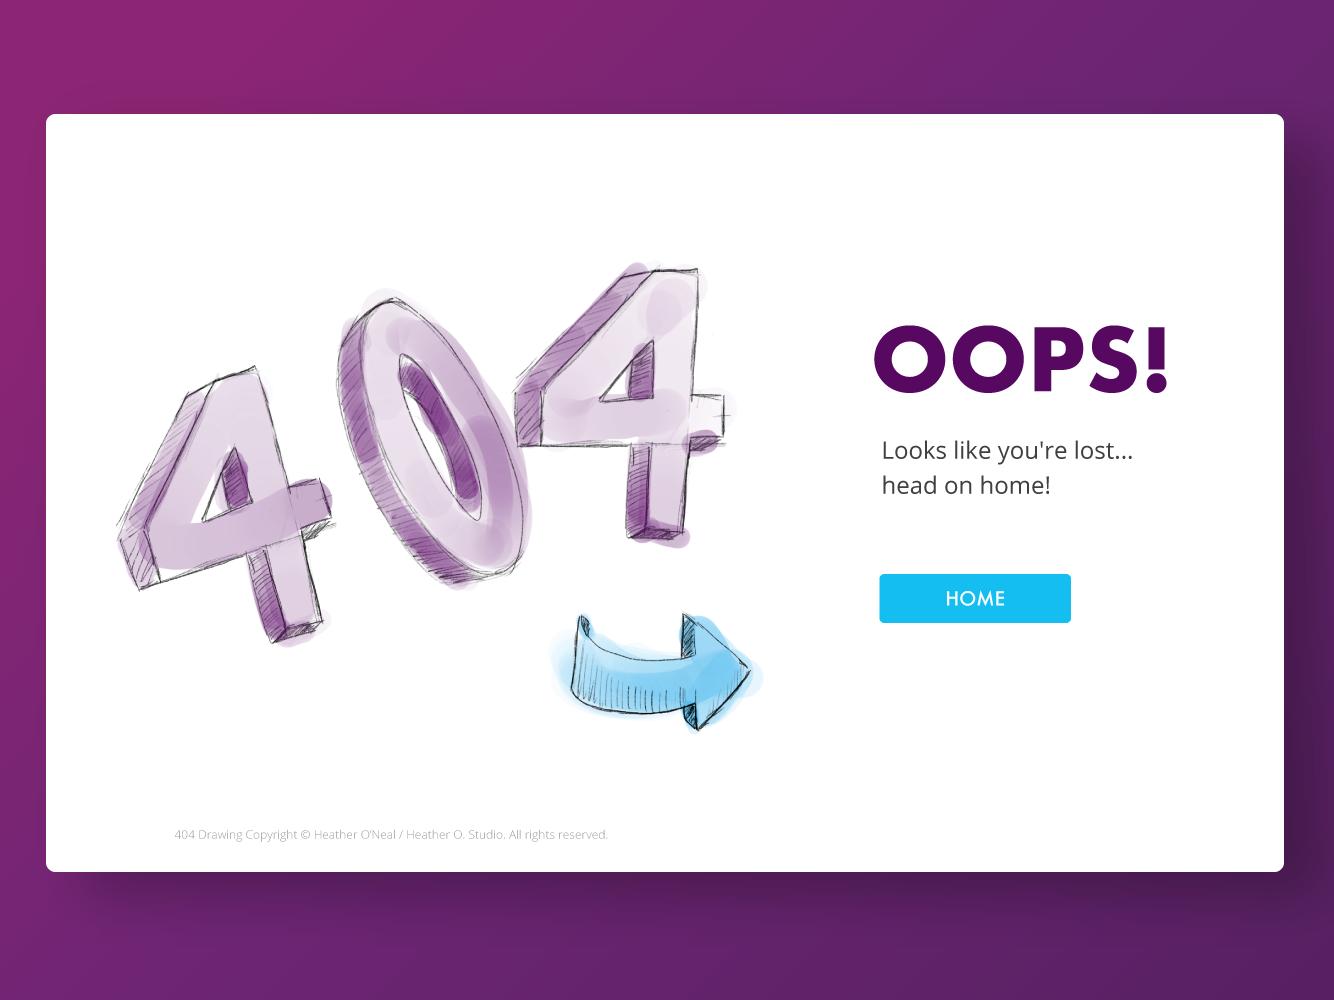 404 Error Splash Screen portfolio art website landing page 404 daily 100 challenge illustration design 404 page ui